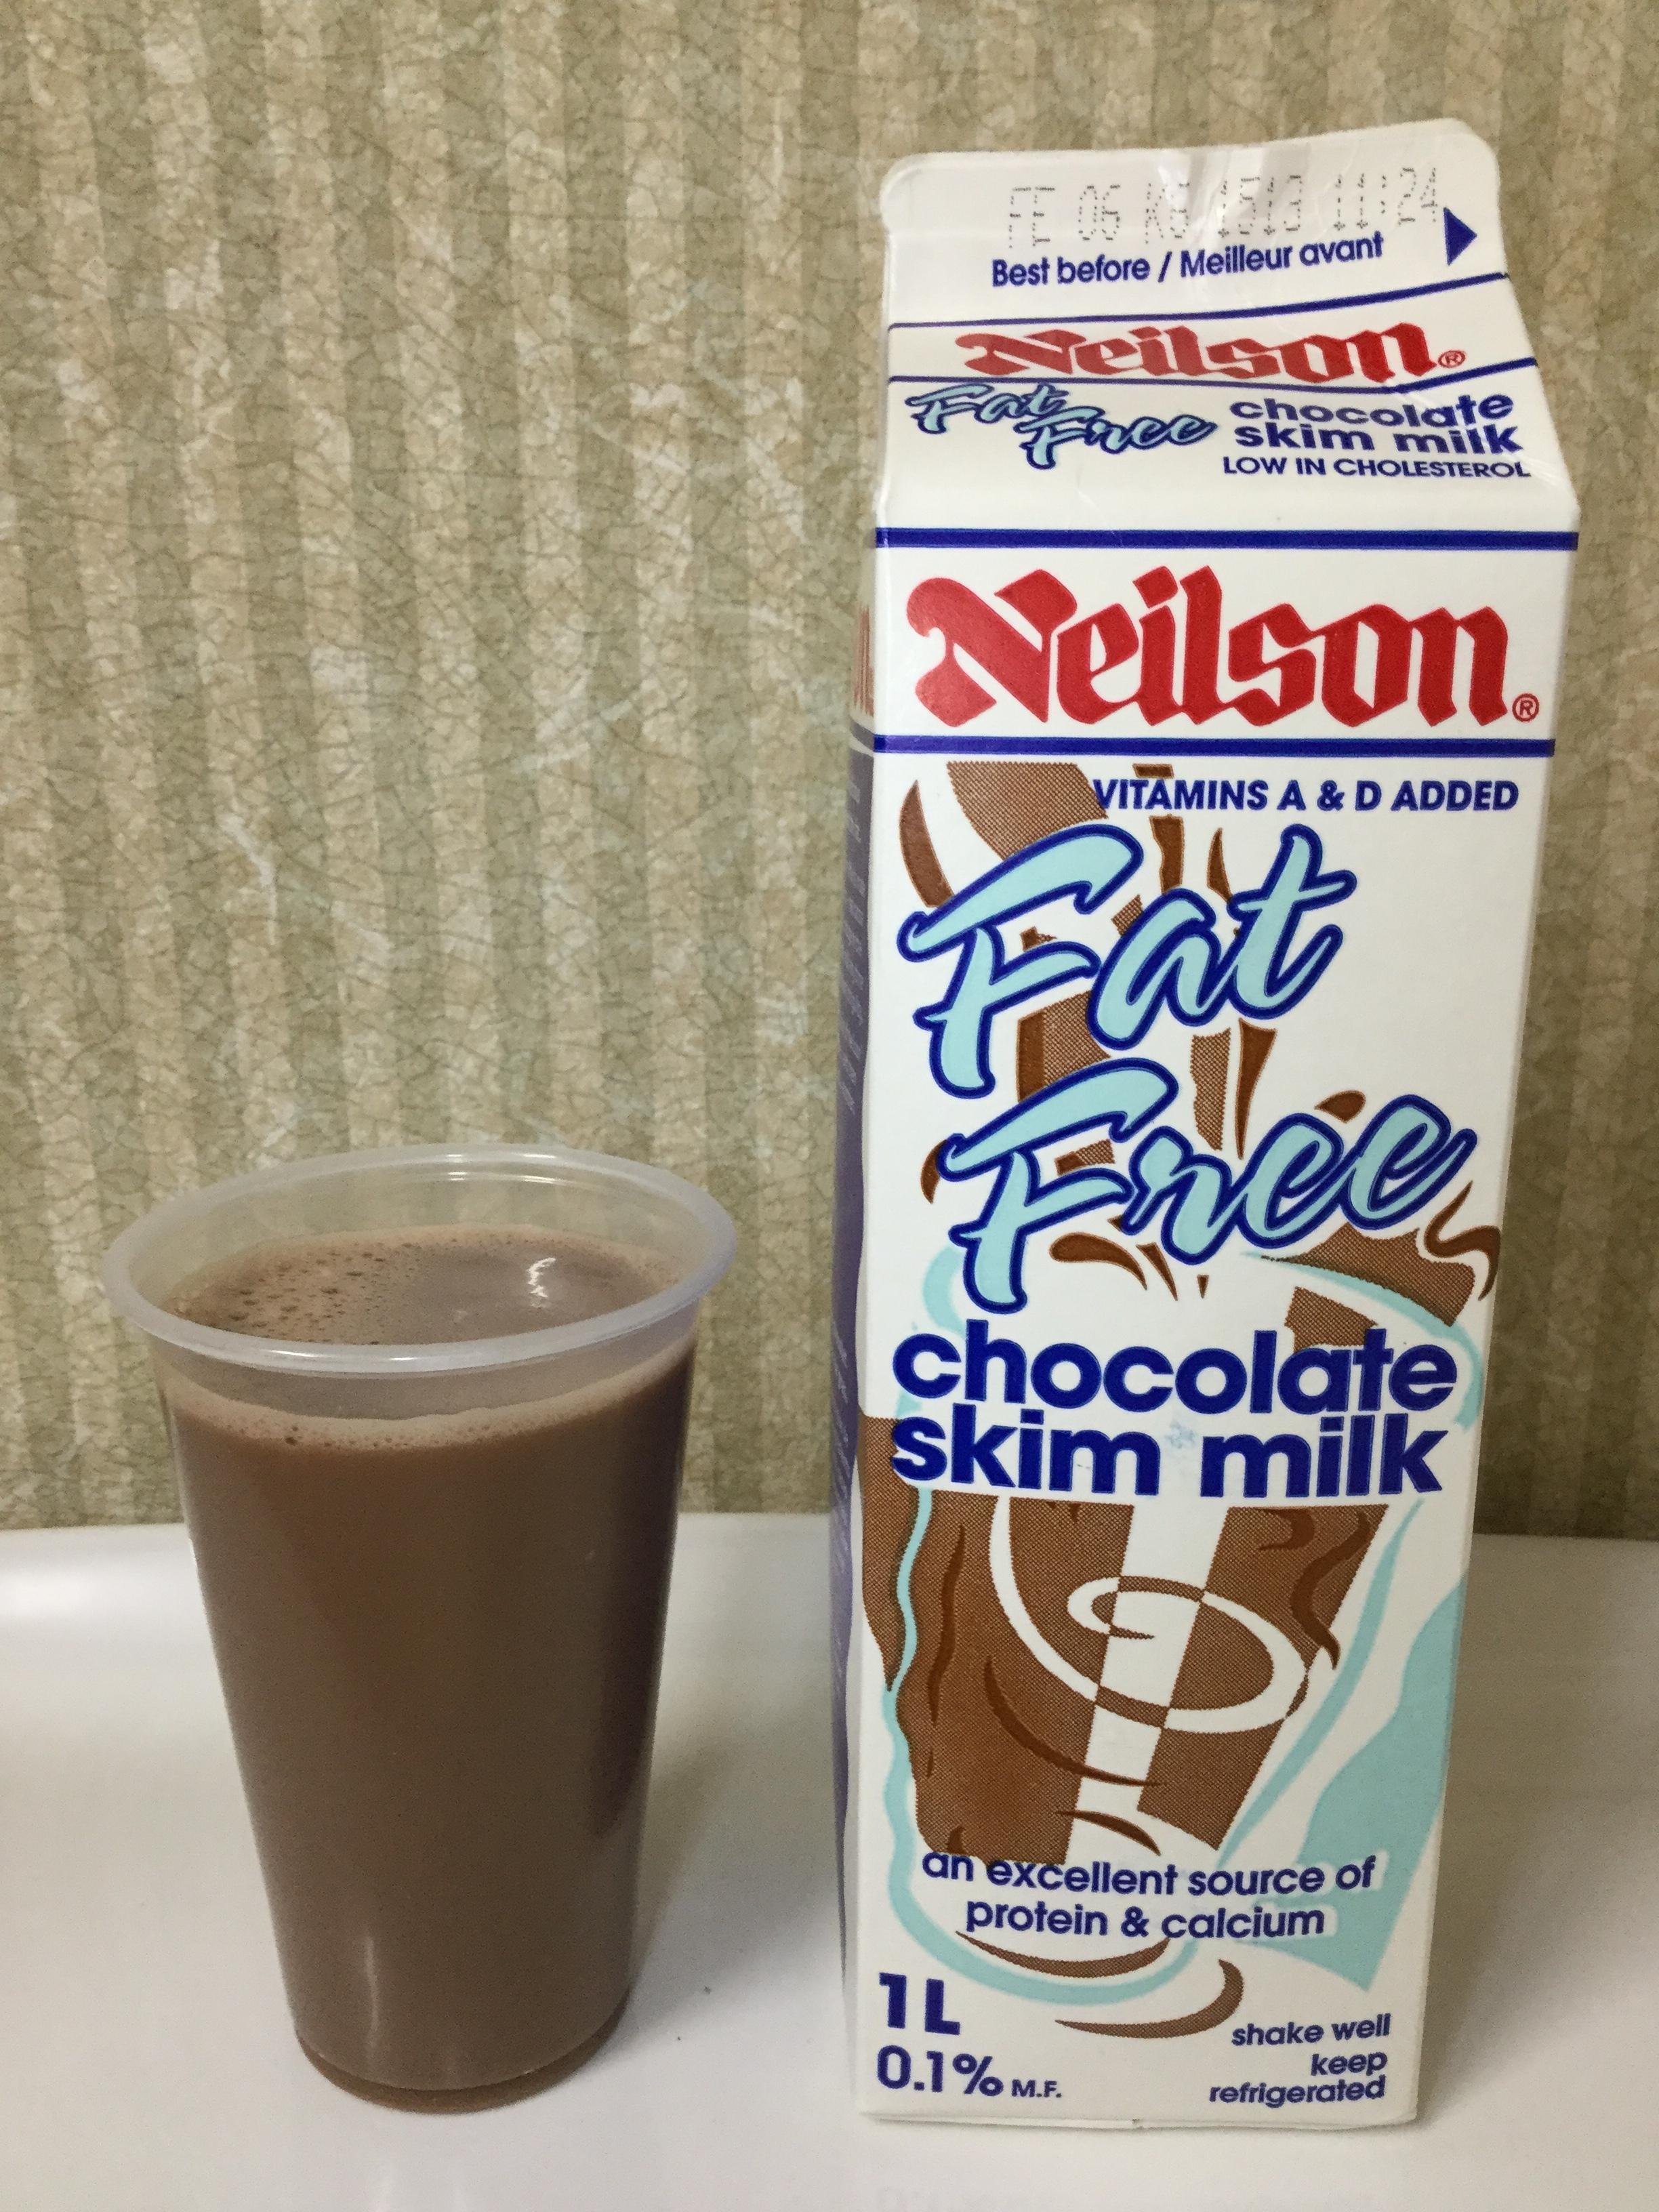 Neilson Fat Free Chocolate Milk Cup